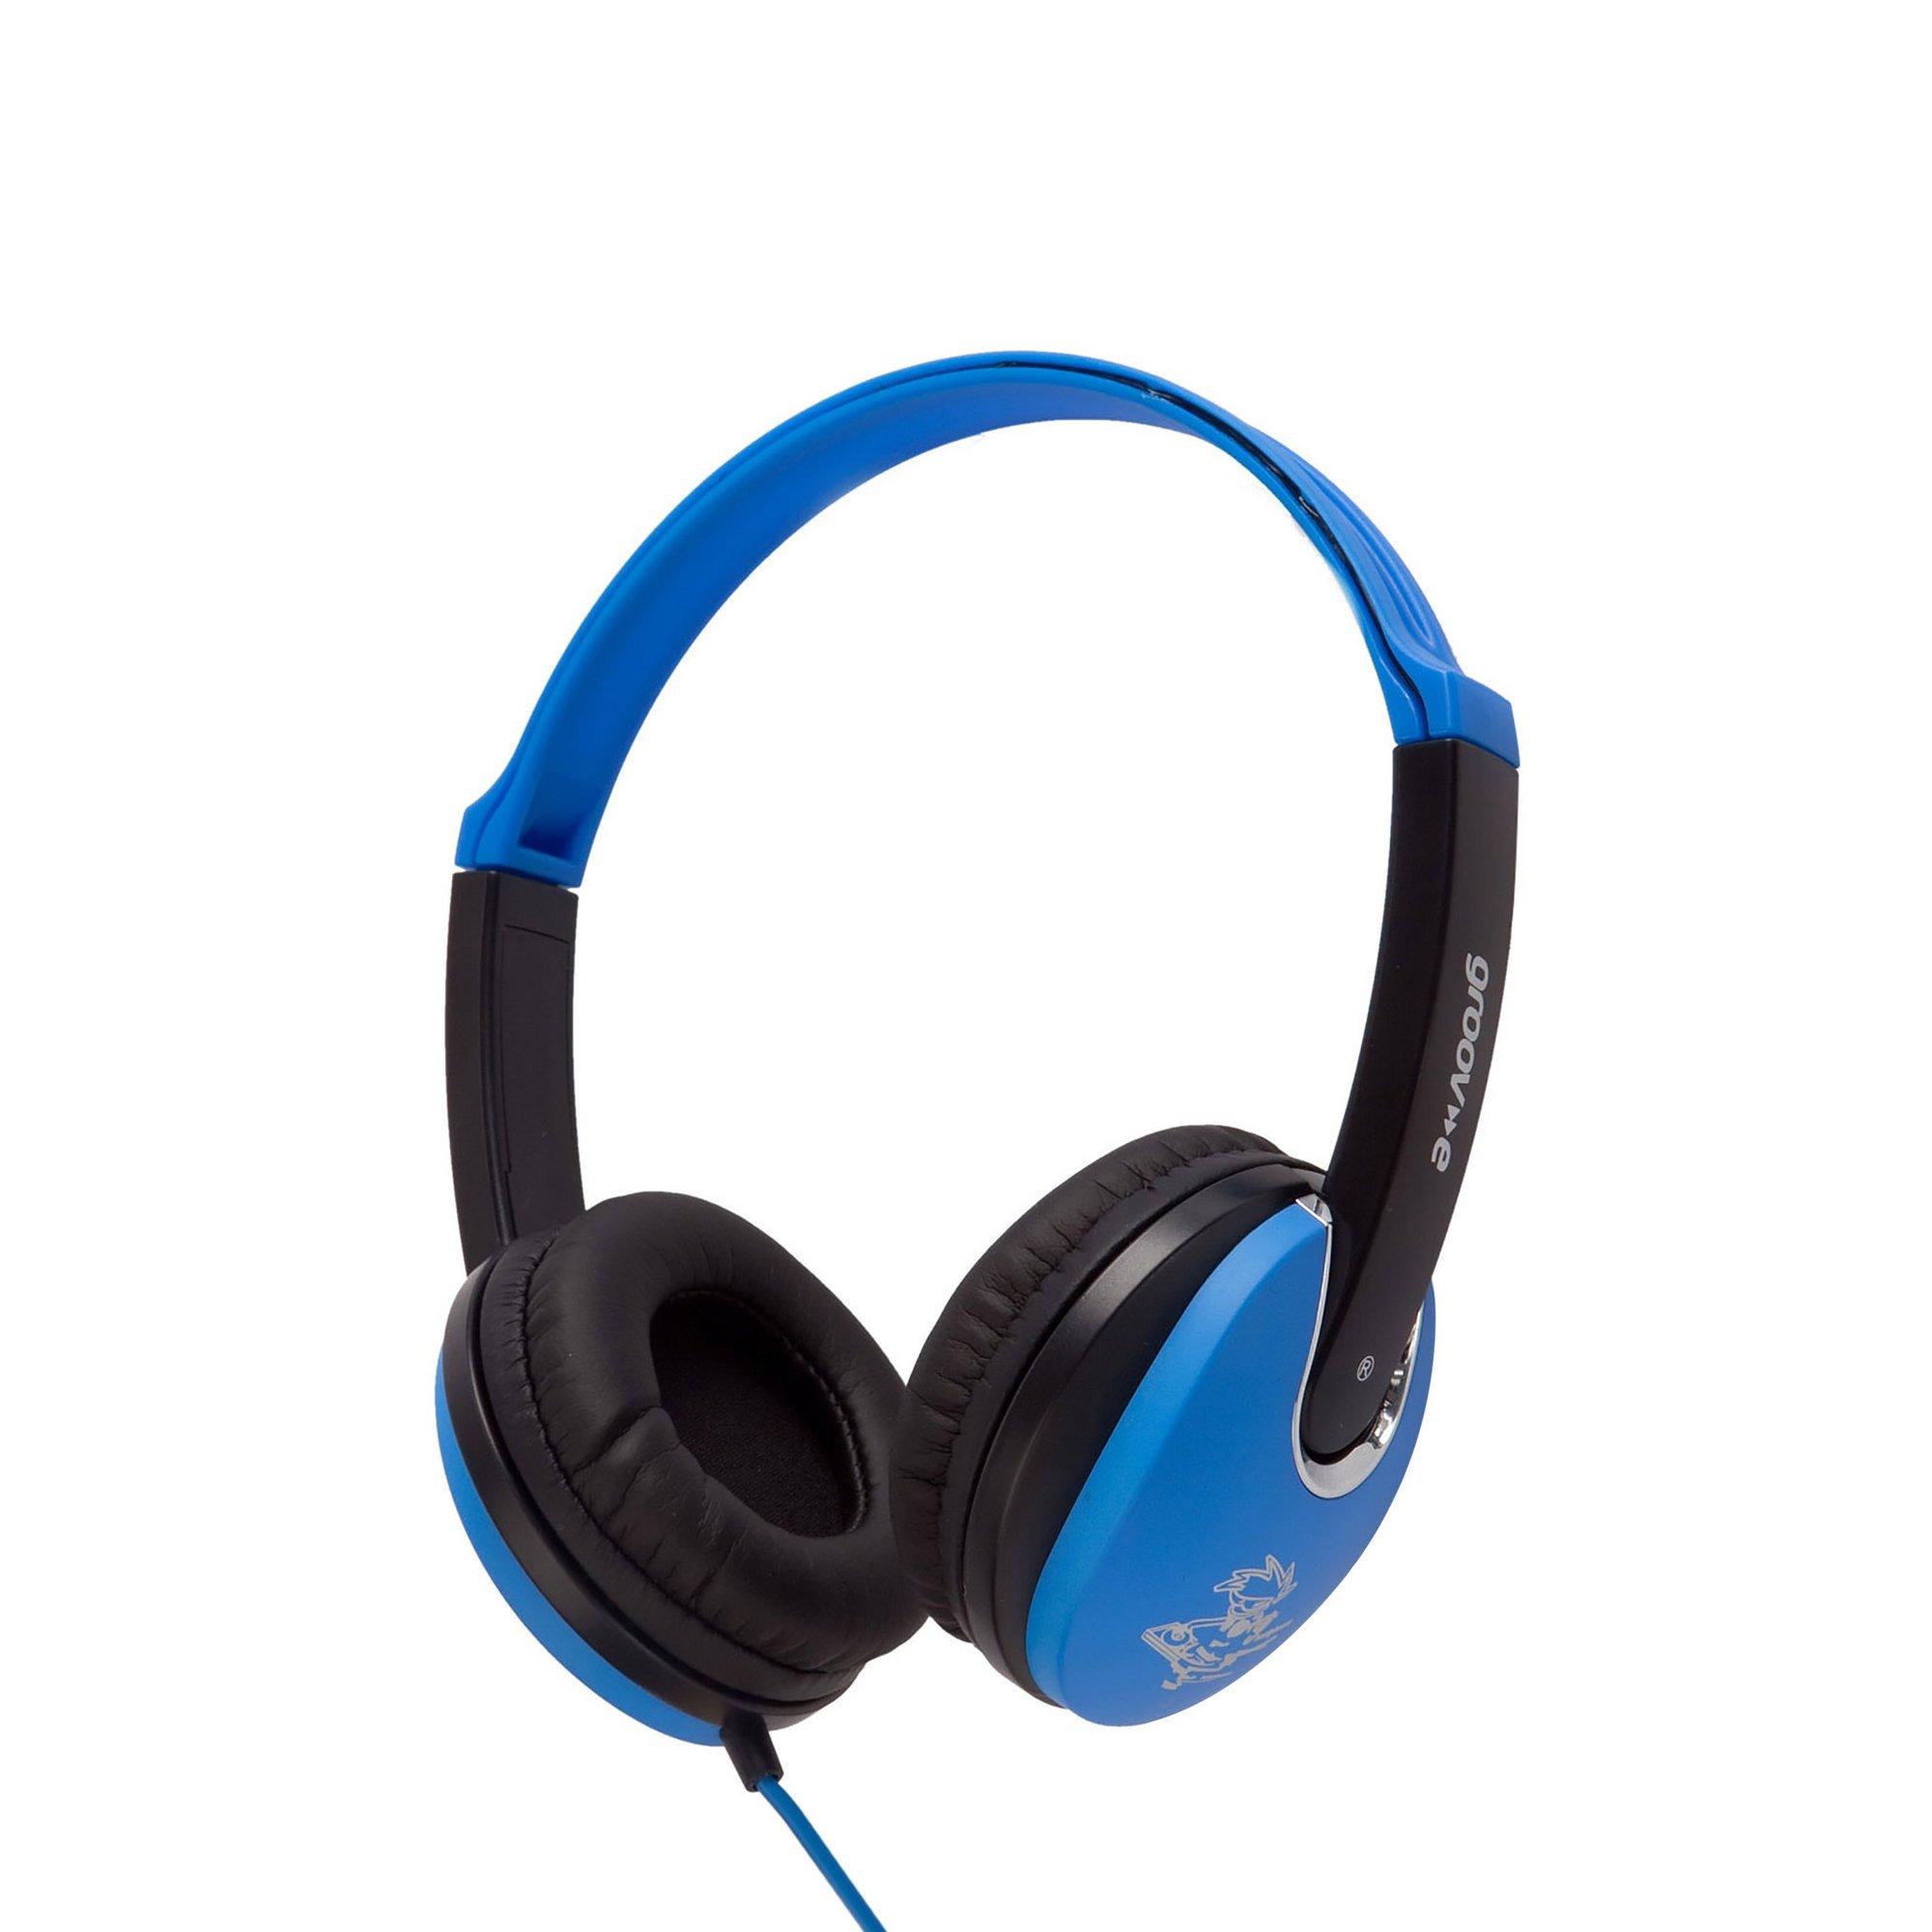 Image of Groov-e Kidz DJ Style Headphones